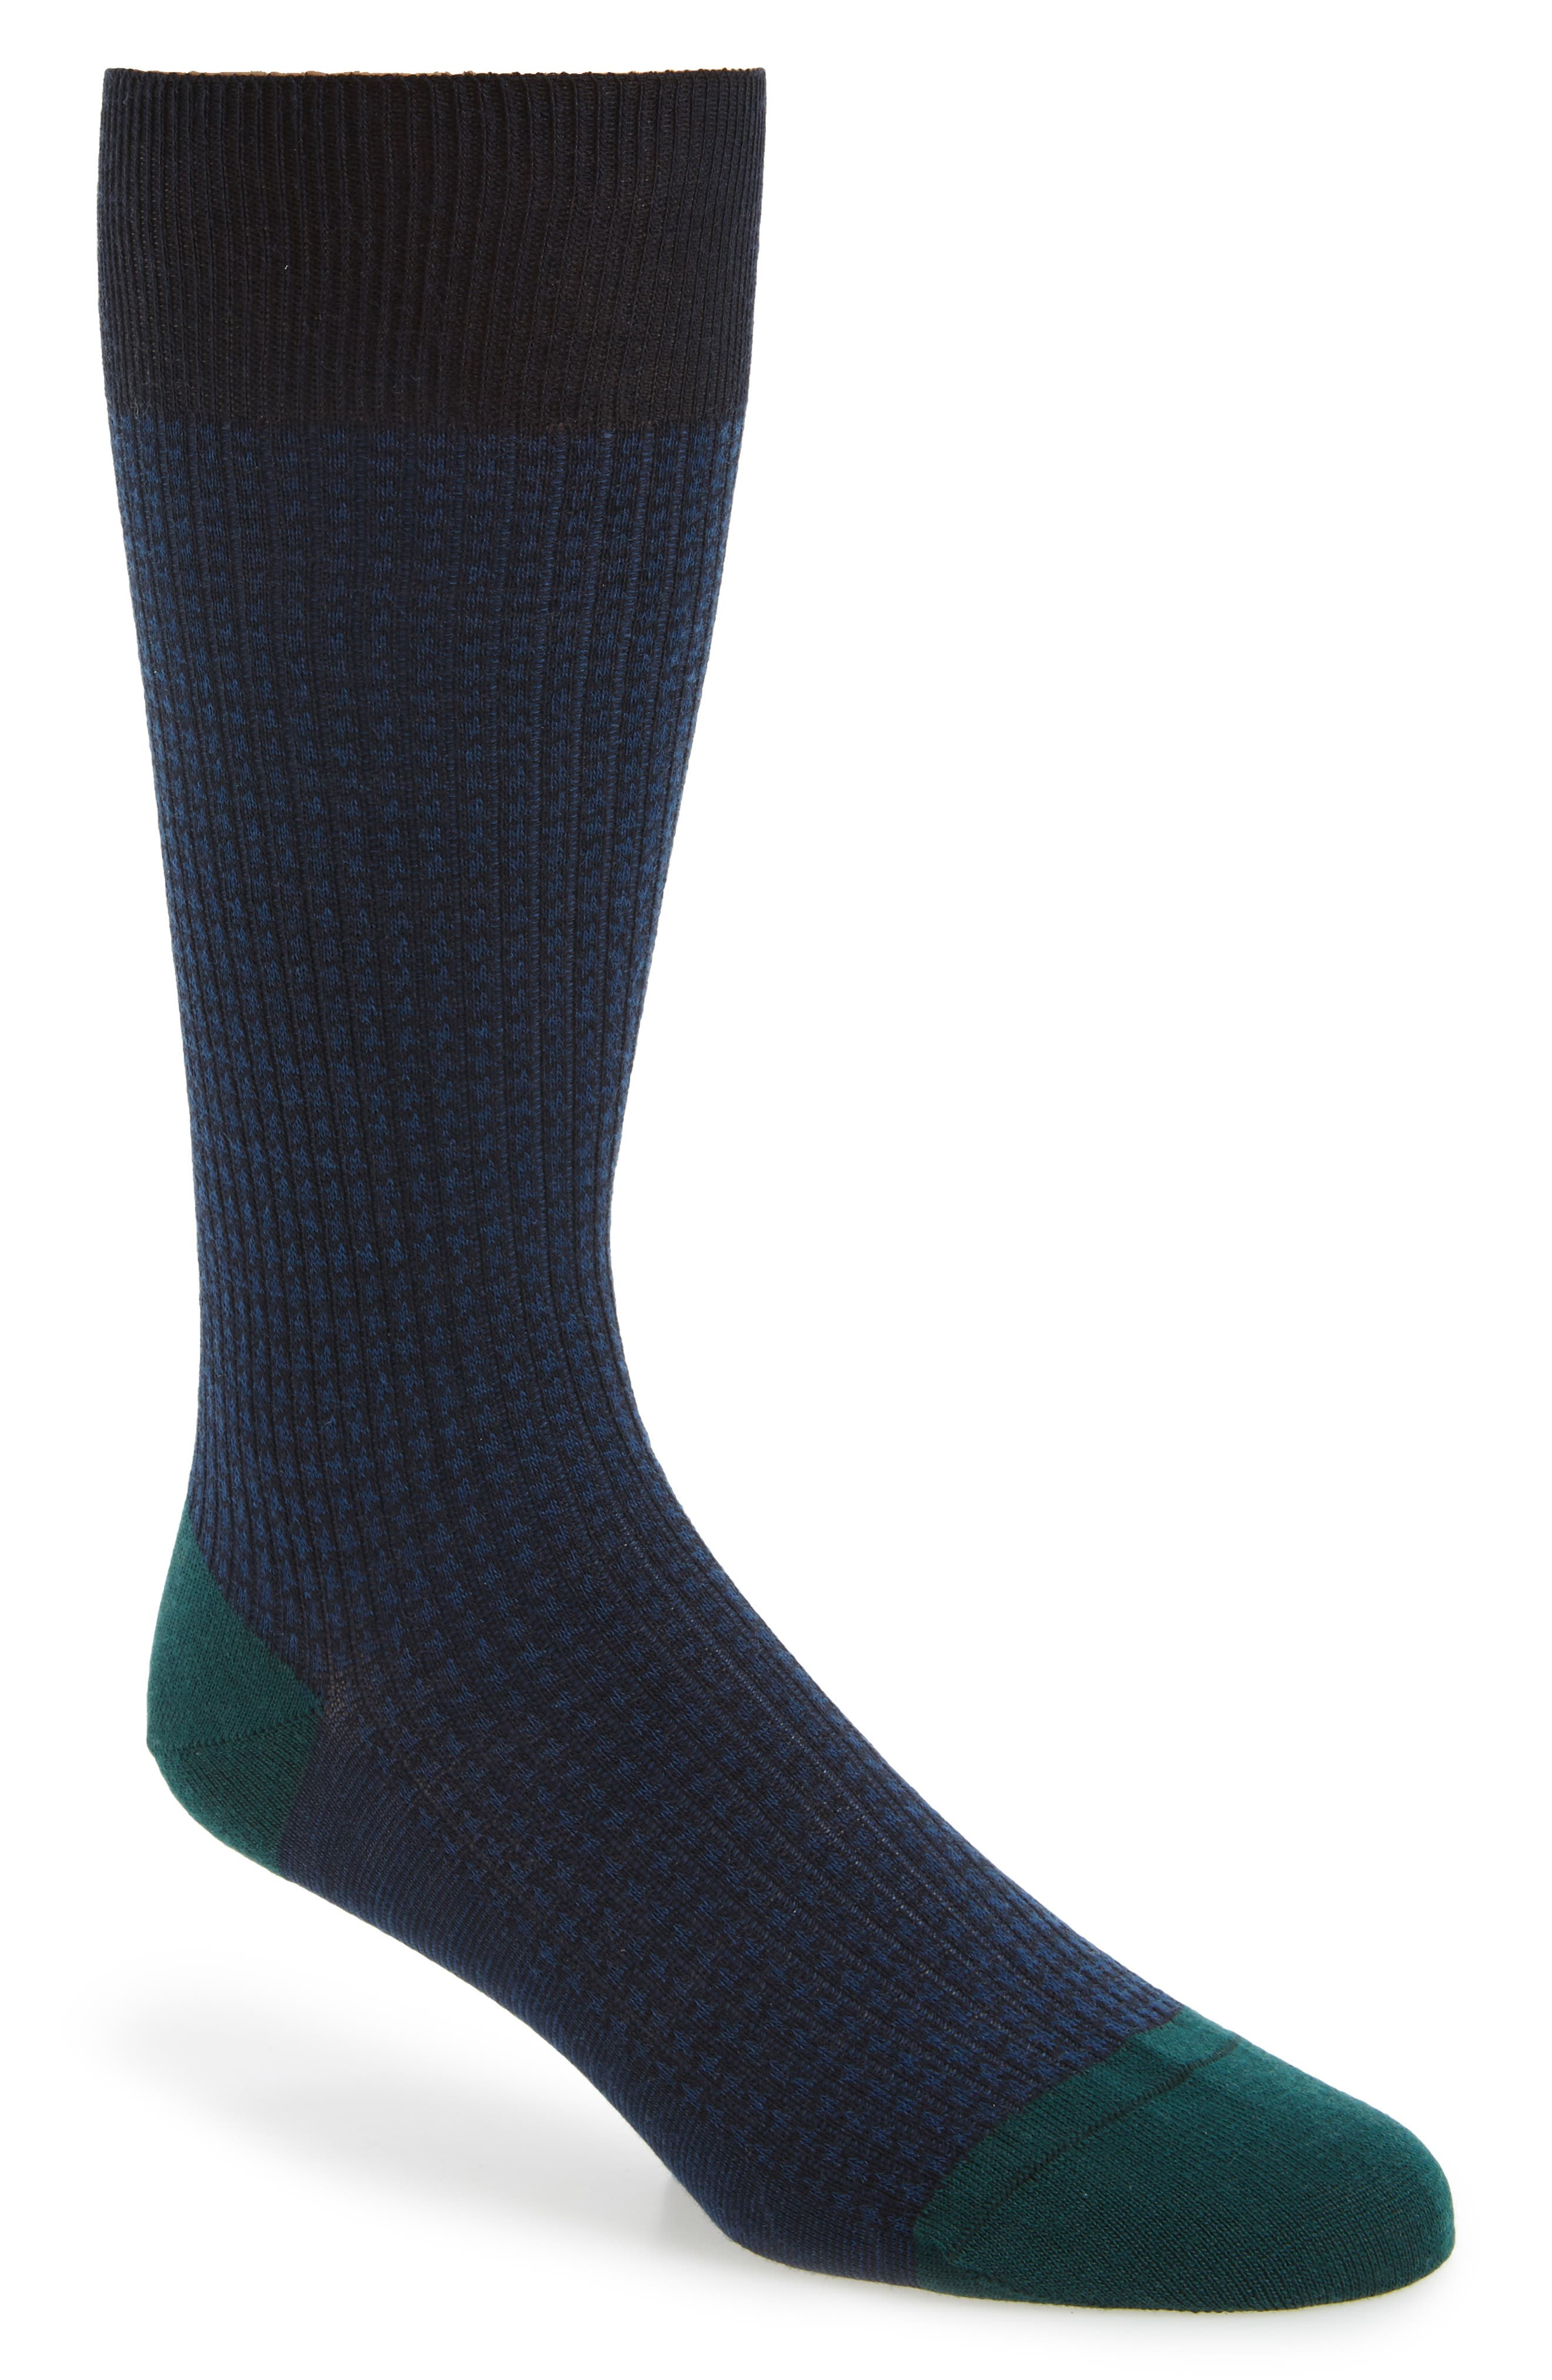 Houndstooth Wool Blend Socks,                         Main,                         color, Navy